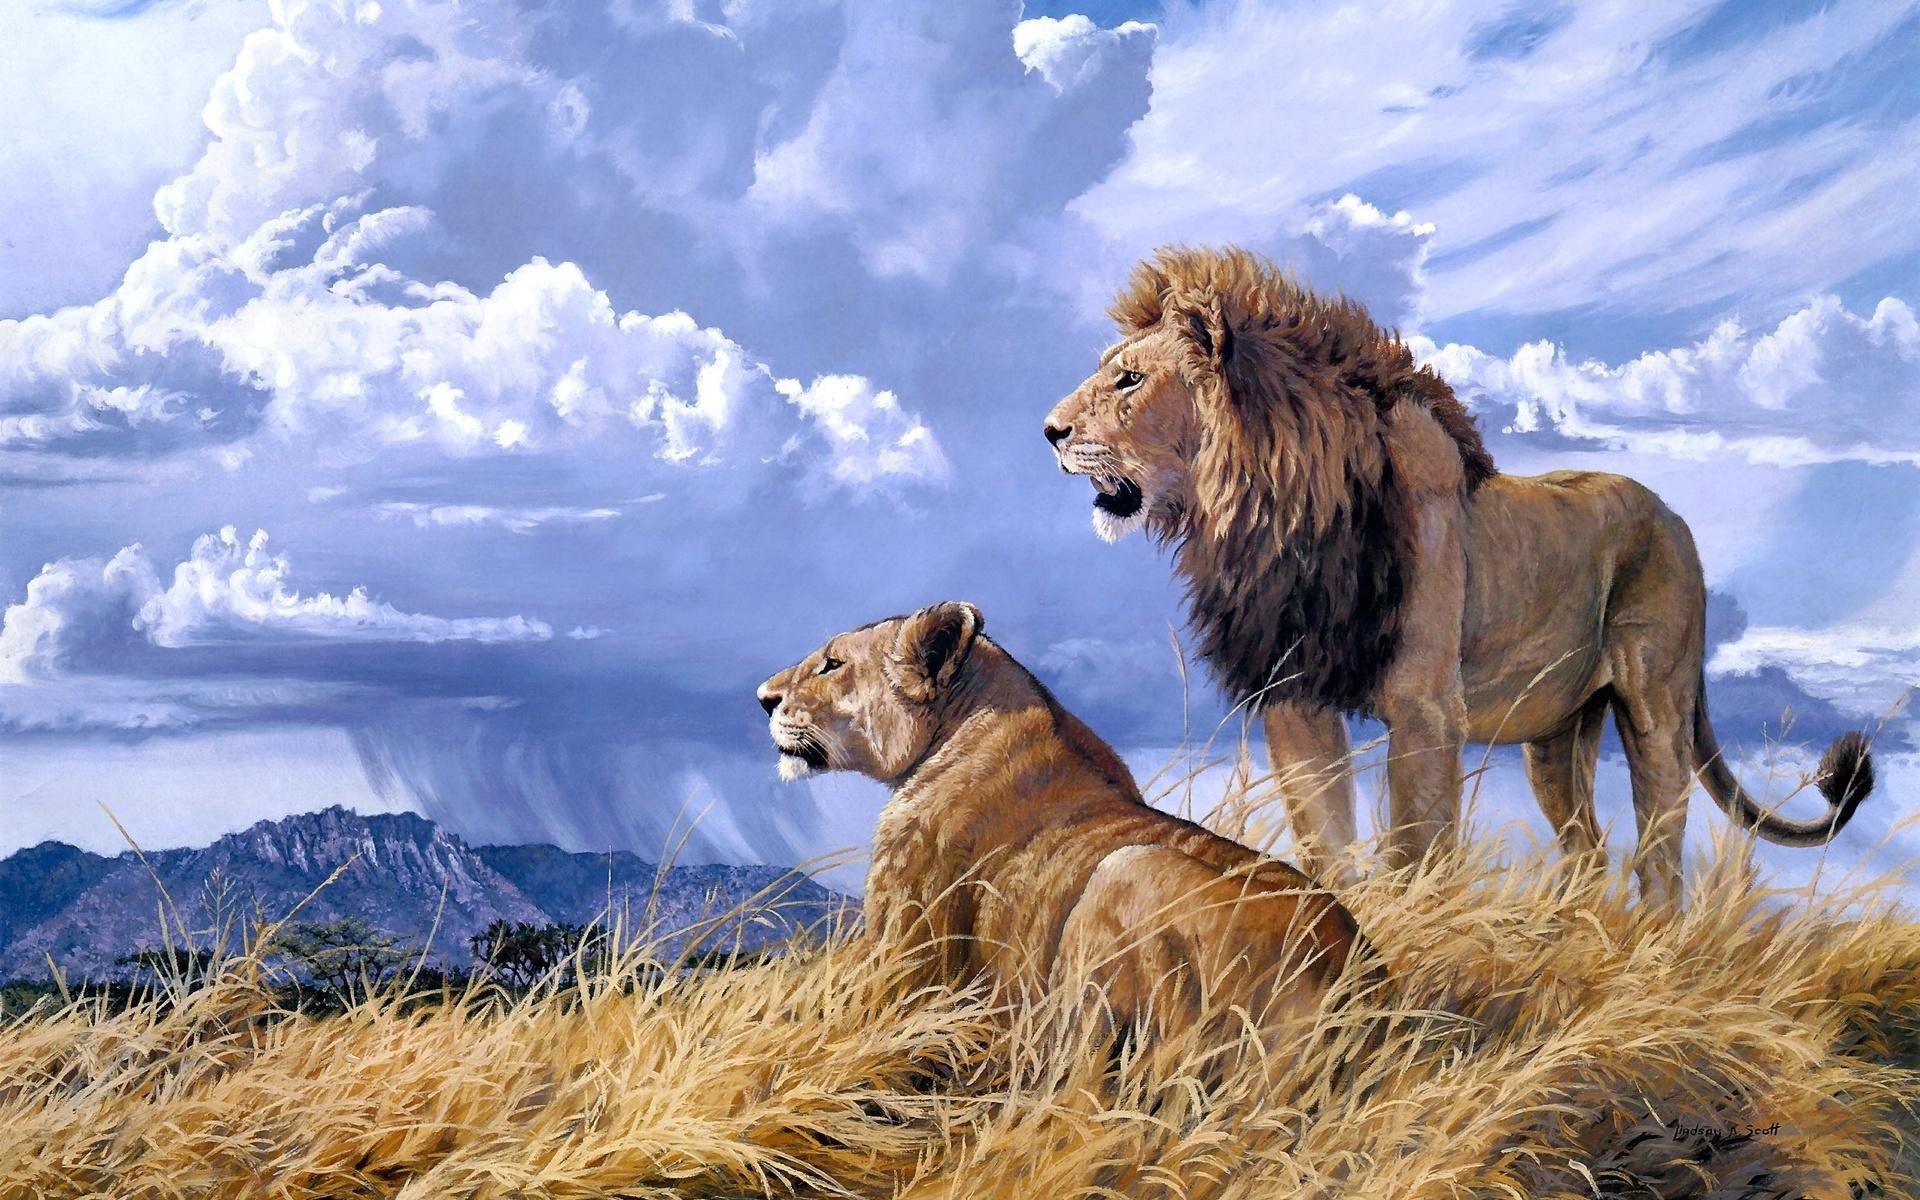 Beautiful nature and animal wallpaper wallpapersafari - Nature and animals wallpaper ...